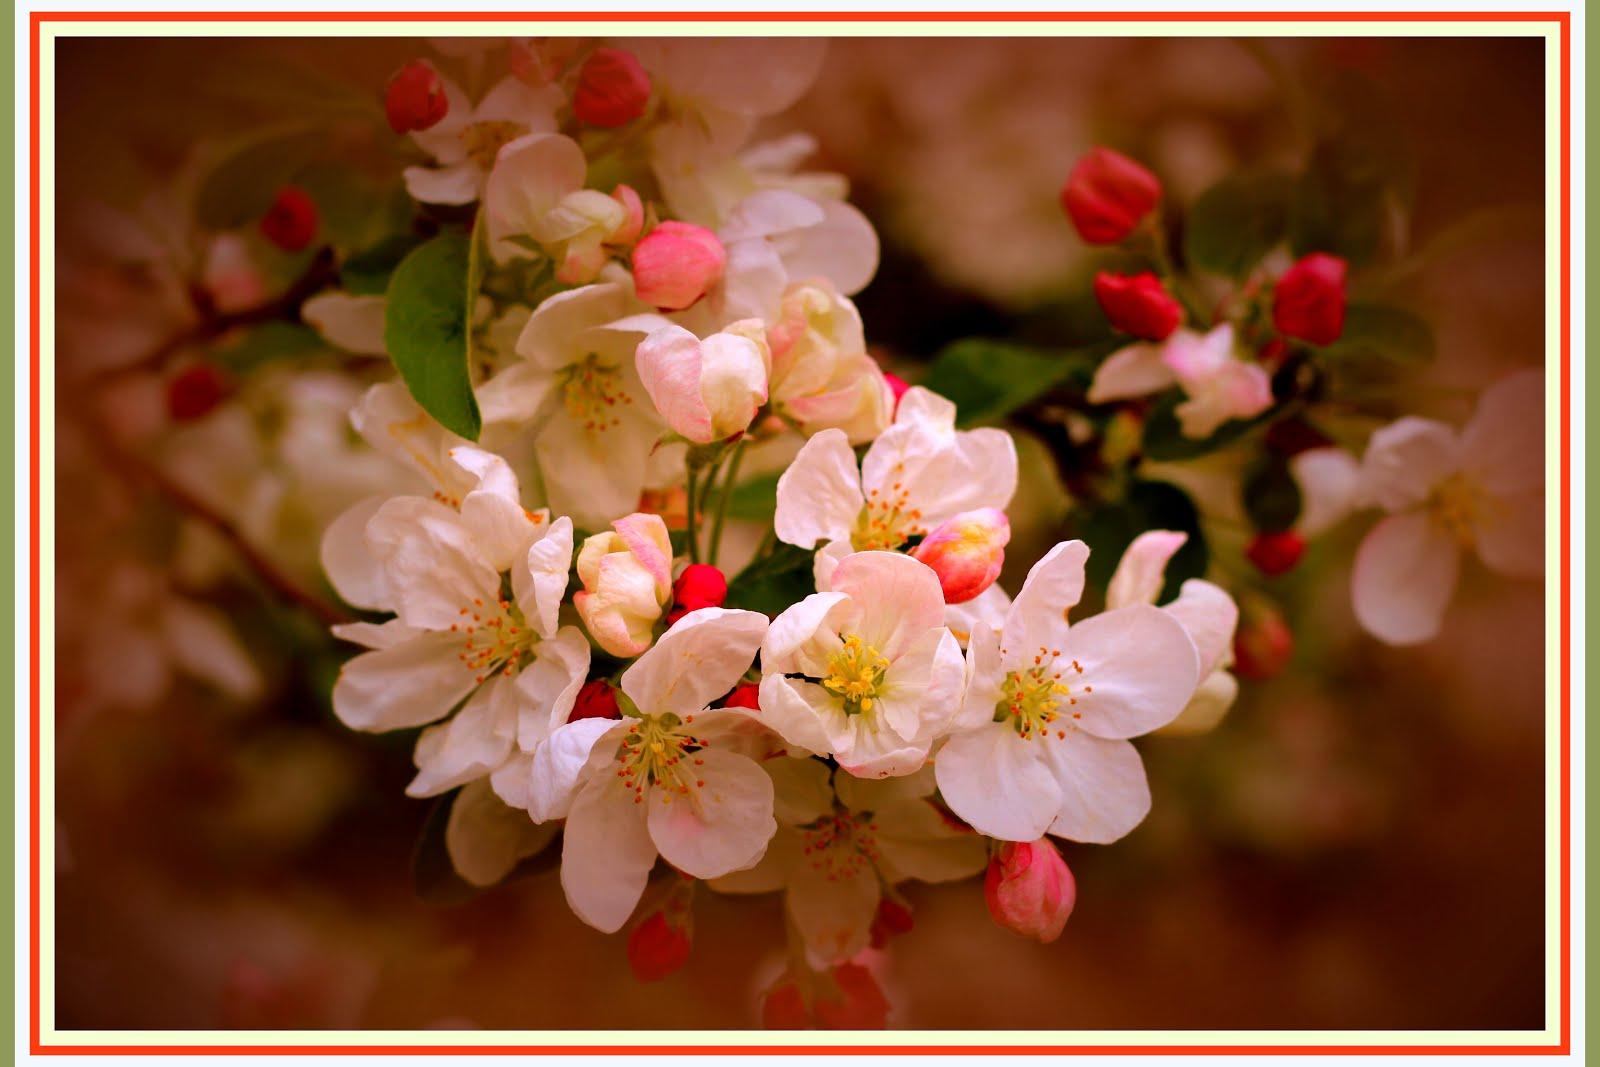 Un arbuste charmeur